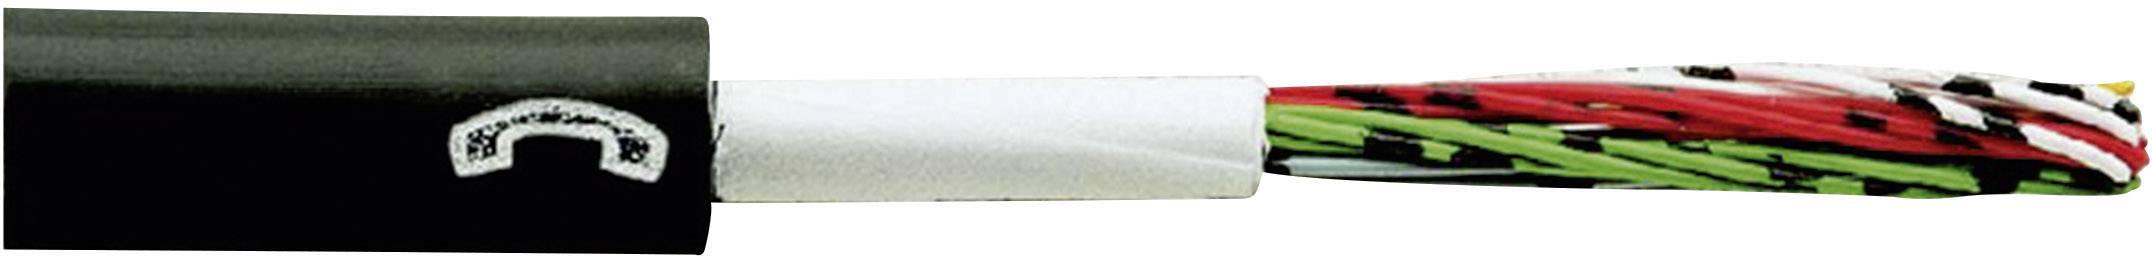 Telefónny kábel A-2Y(L)2Y Faber Kabel 110076, 2 x 2 x 0.8 mm, čierna, metrový tovar